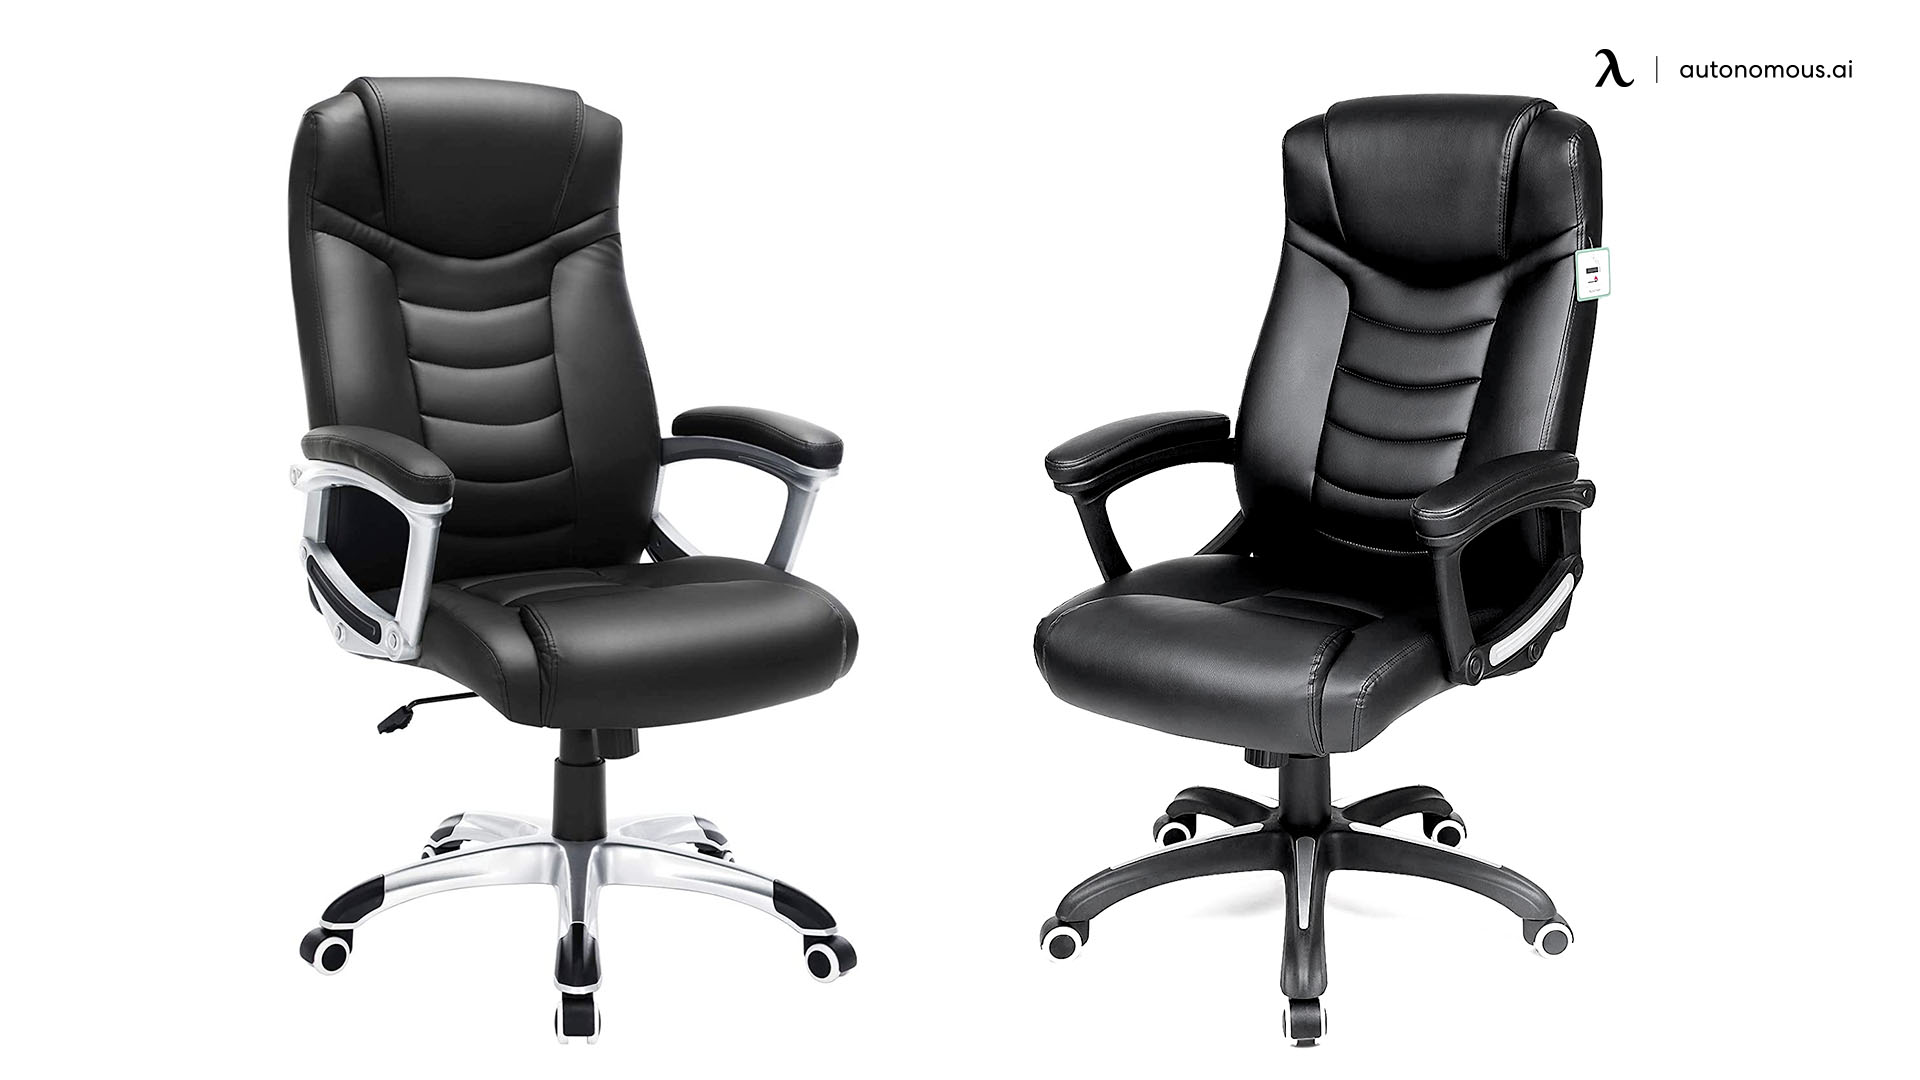 SONGMICS Office Executive Swivel Chair